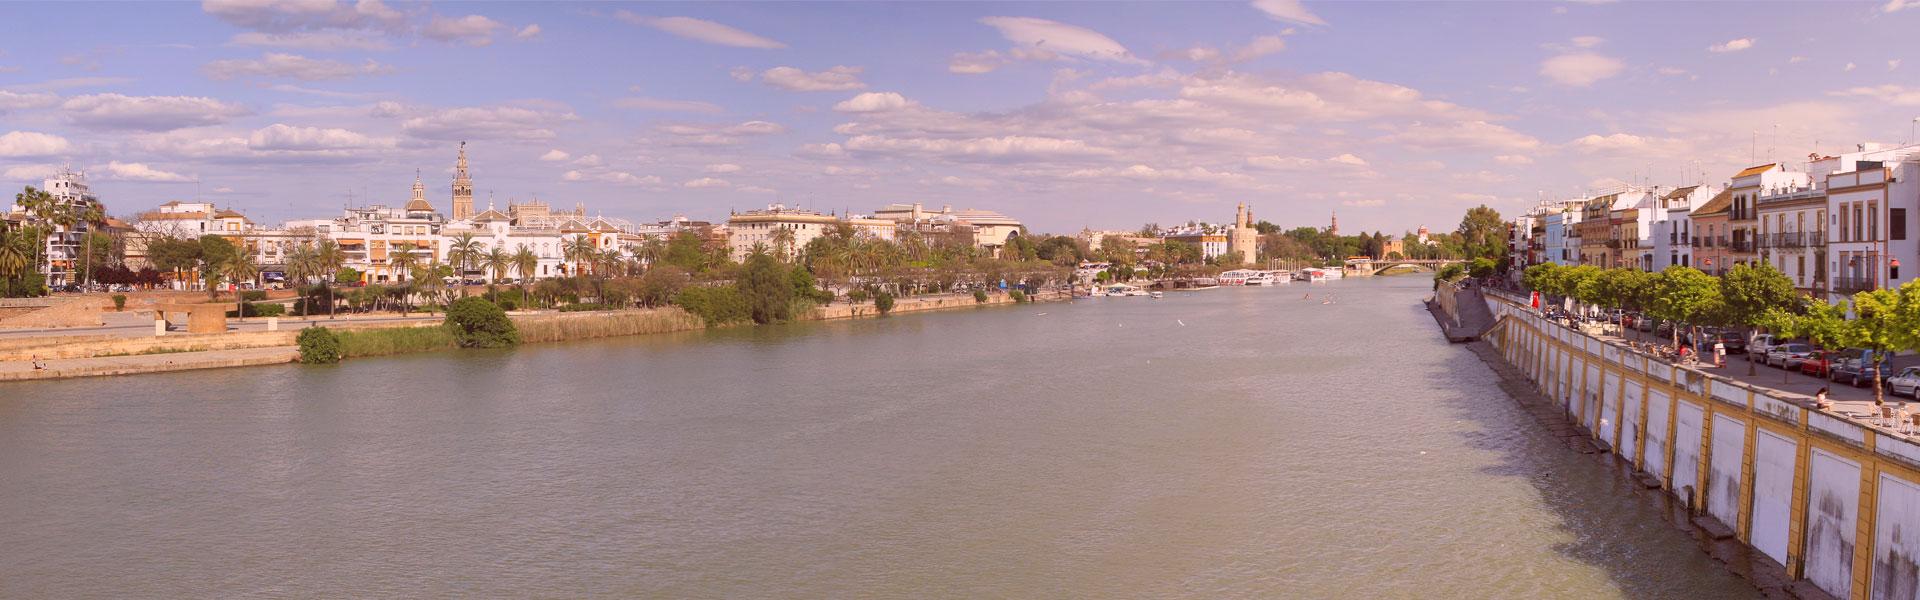 river seville